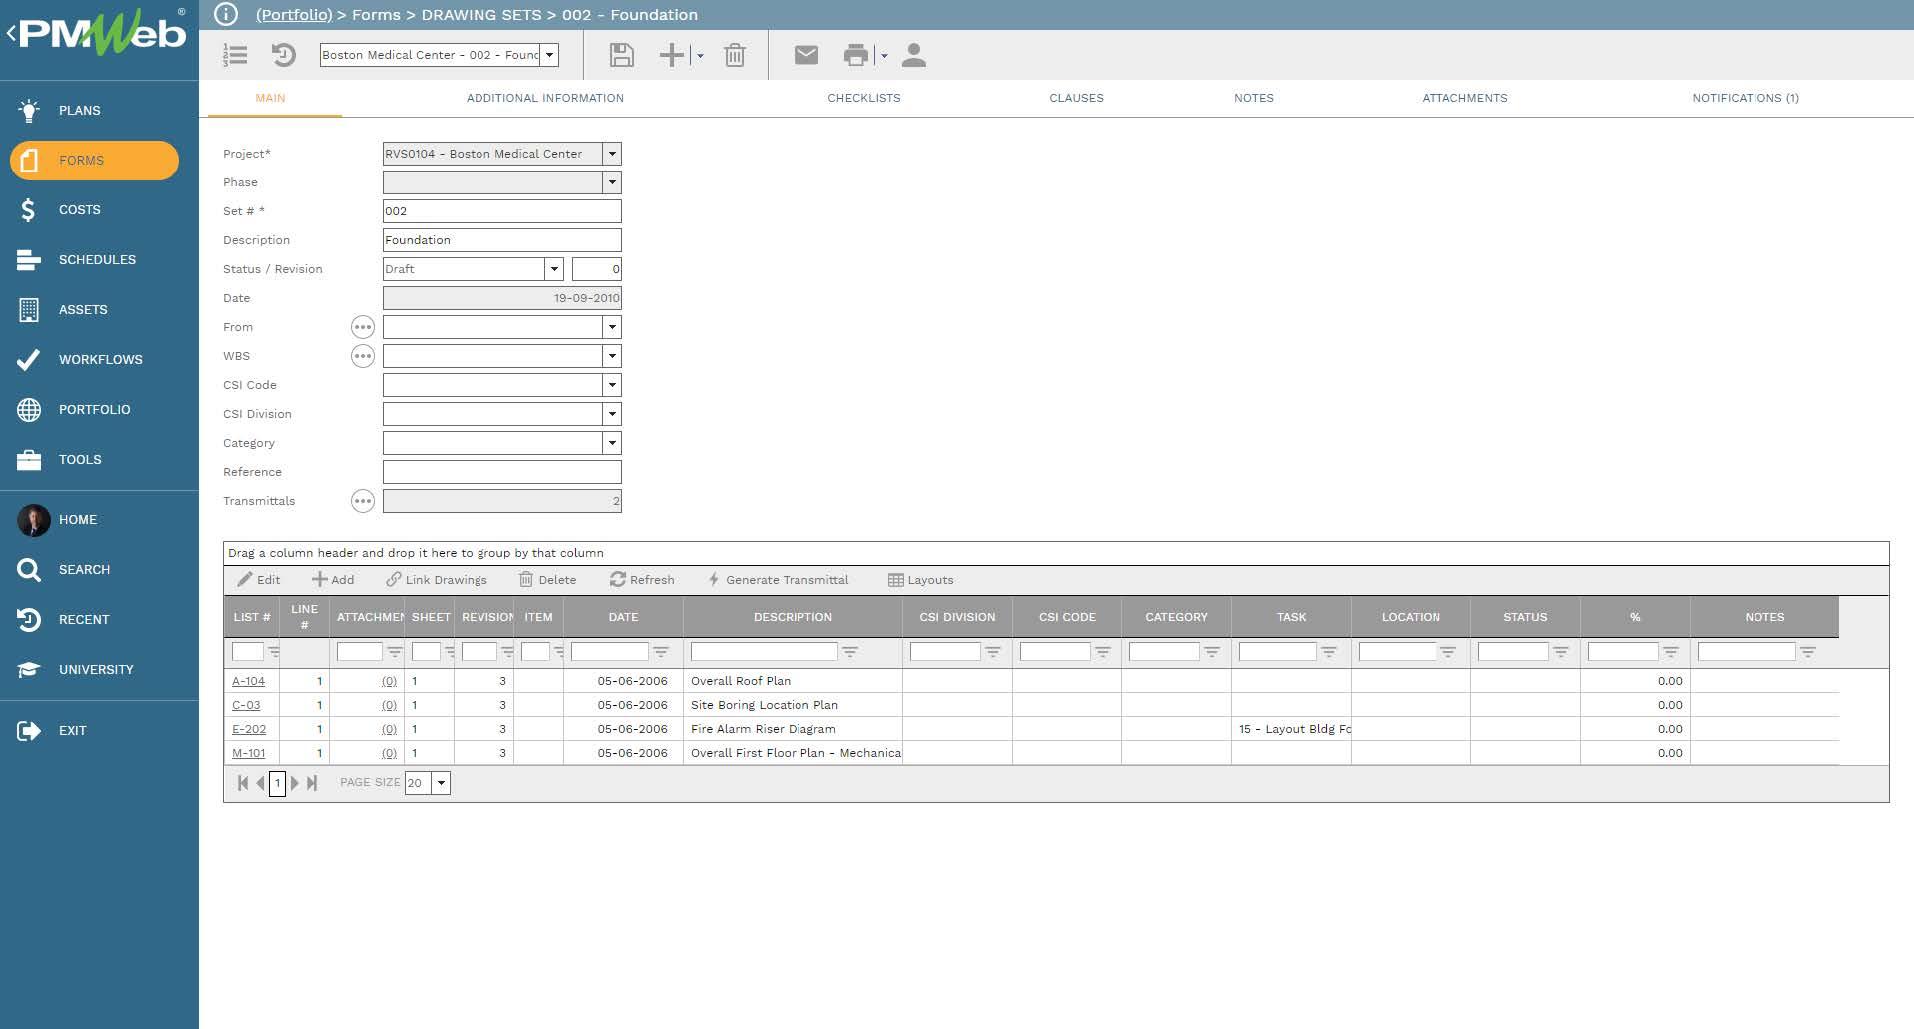 PMWeb 7 Forms Drawing Sets Foundation Main